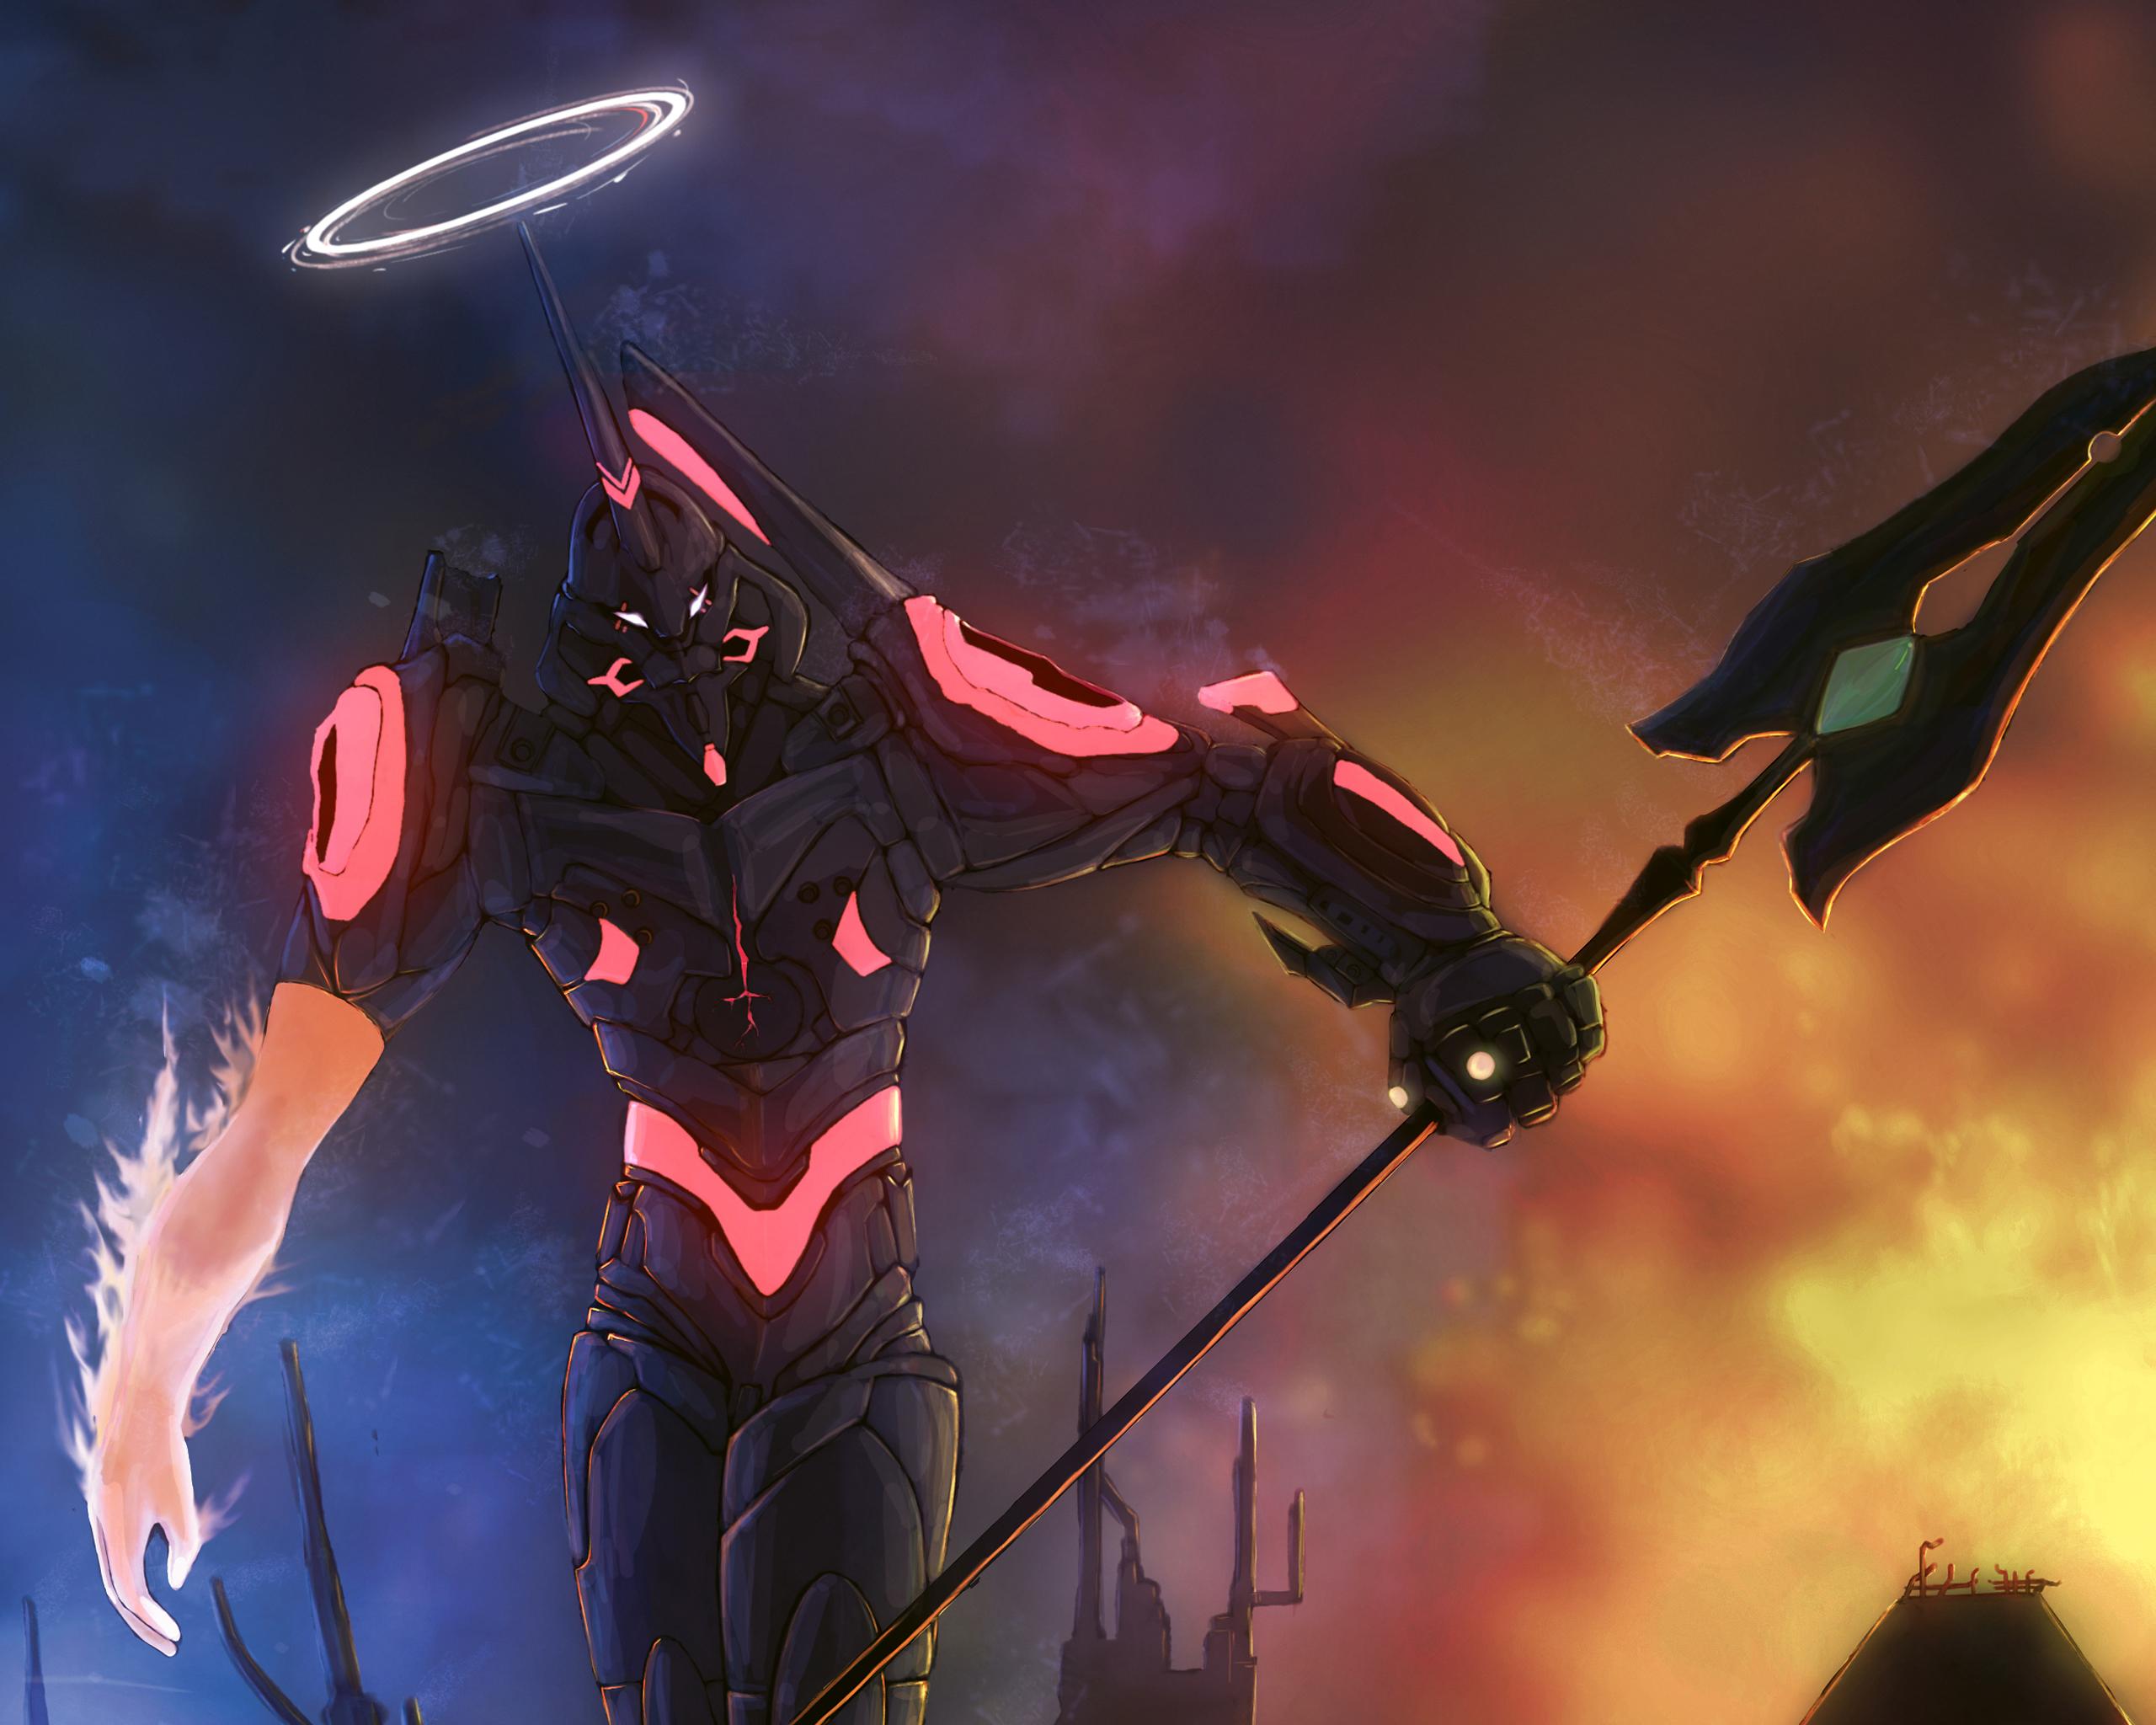 evangelion wallpaper hd anime - photo #47